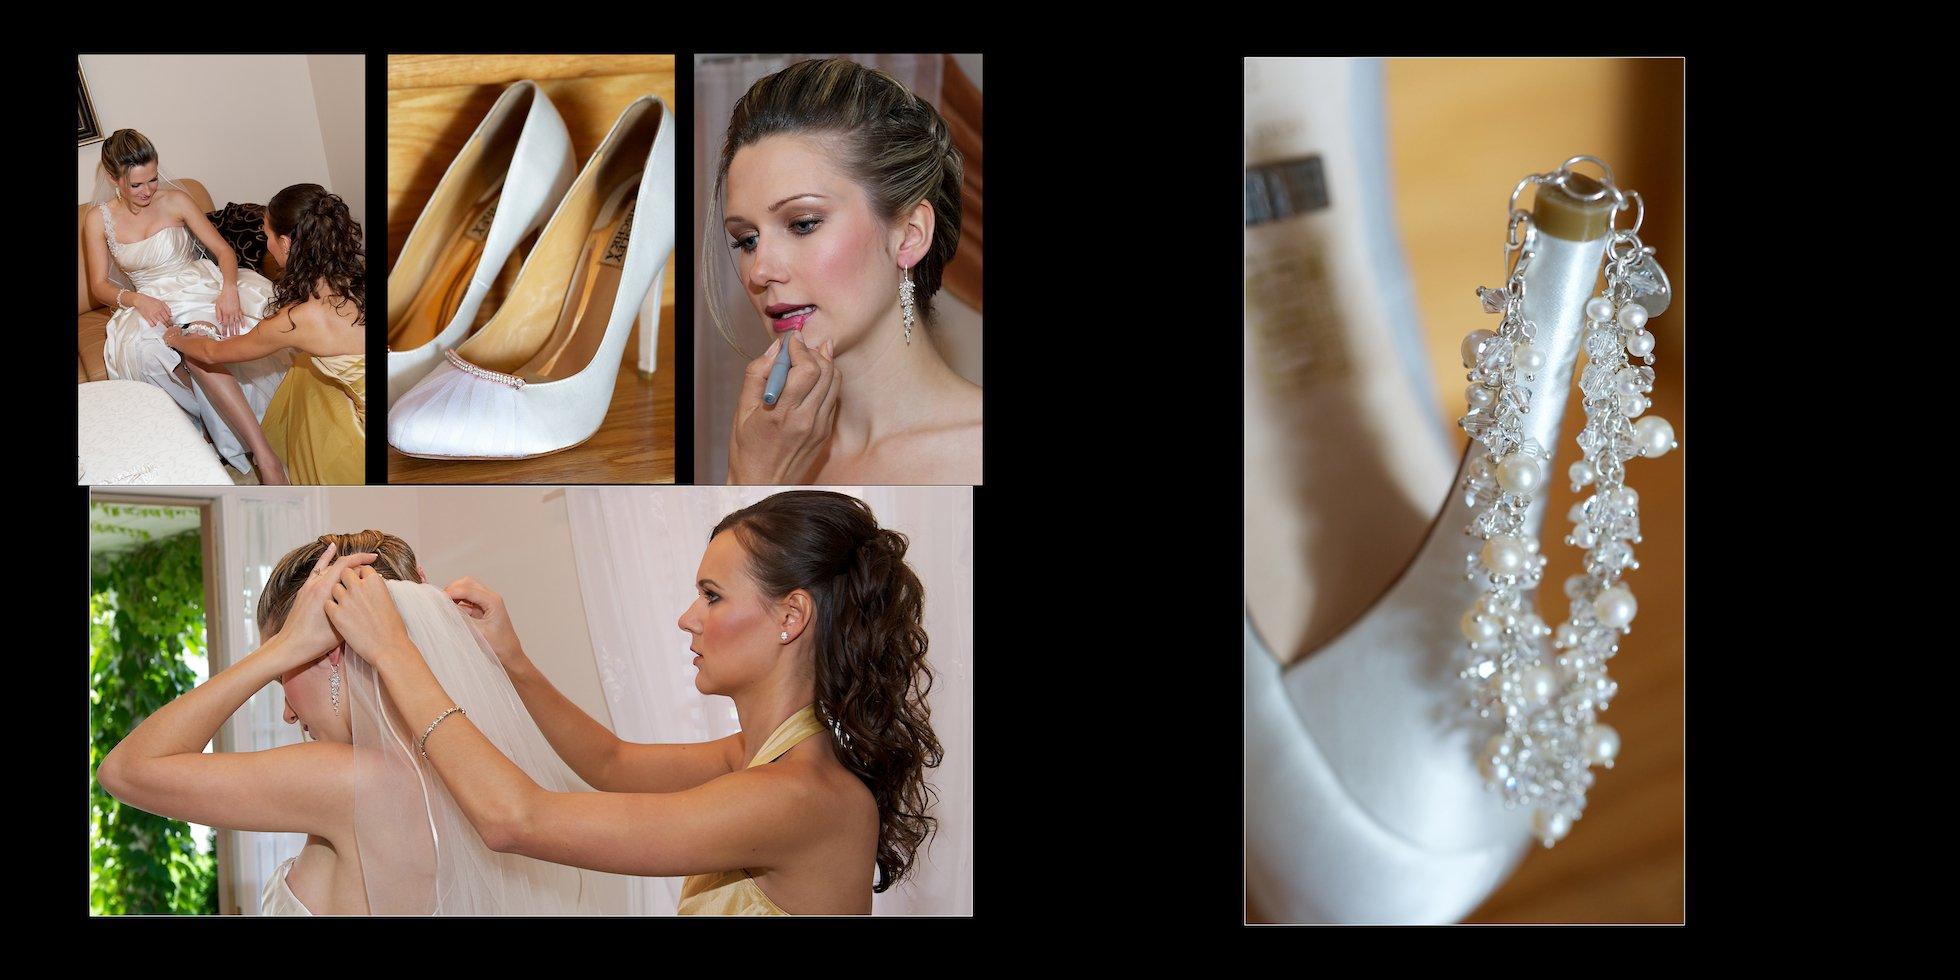 wedding details by a toronto wedding photographer